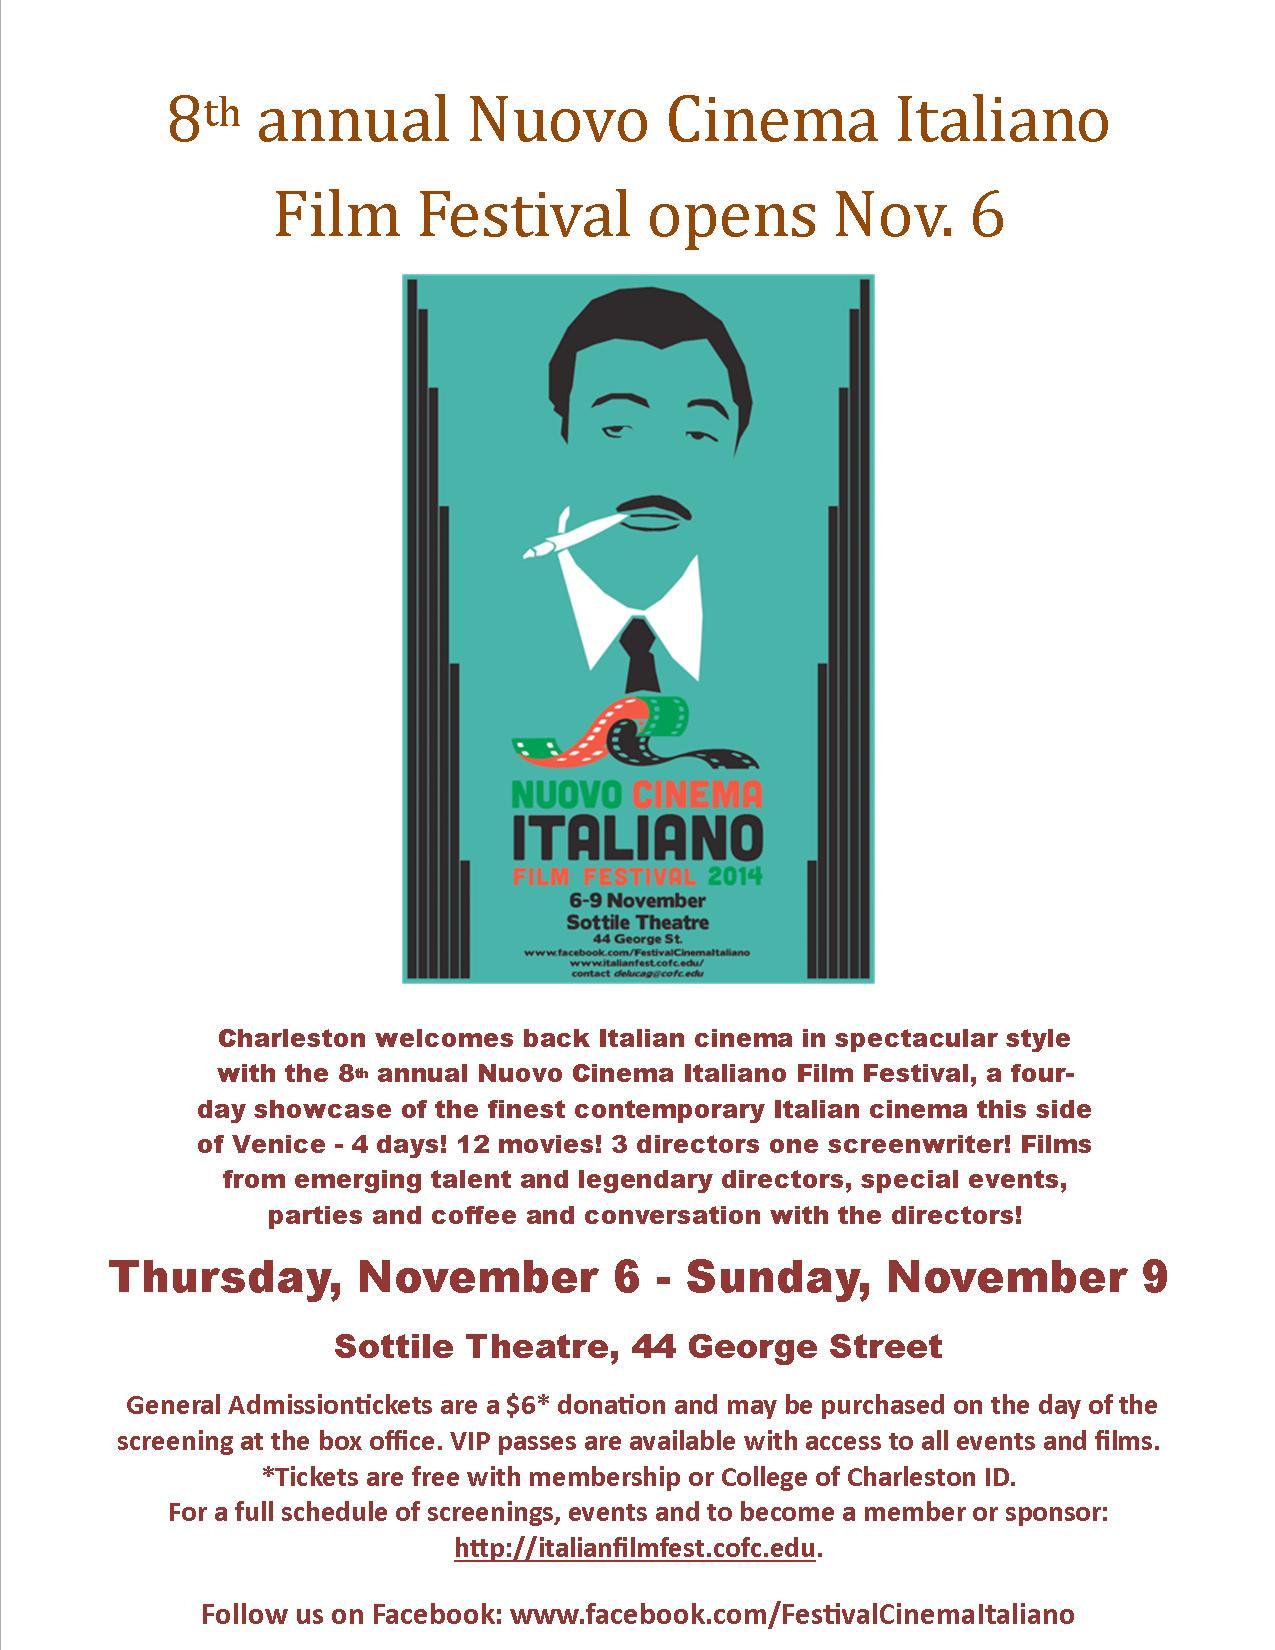 ItalianoFilmFestival